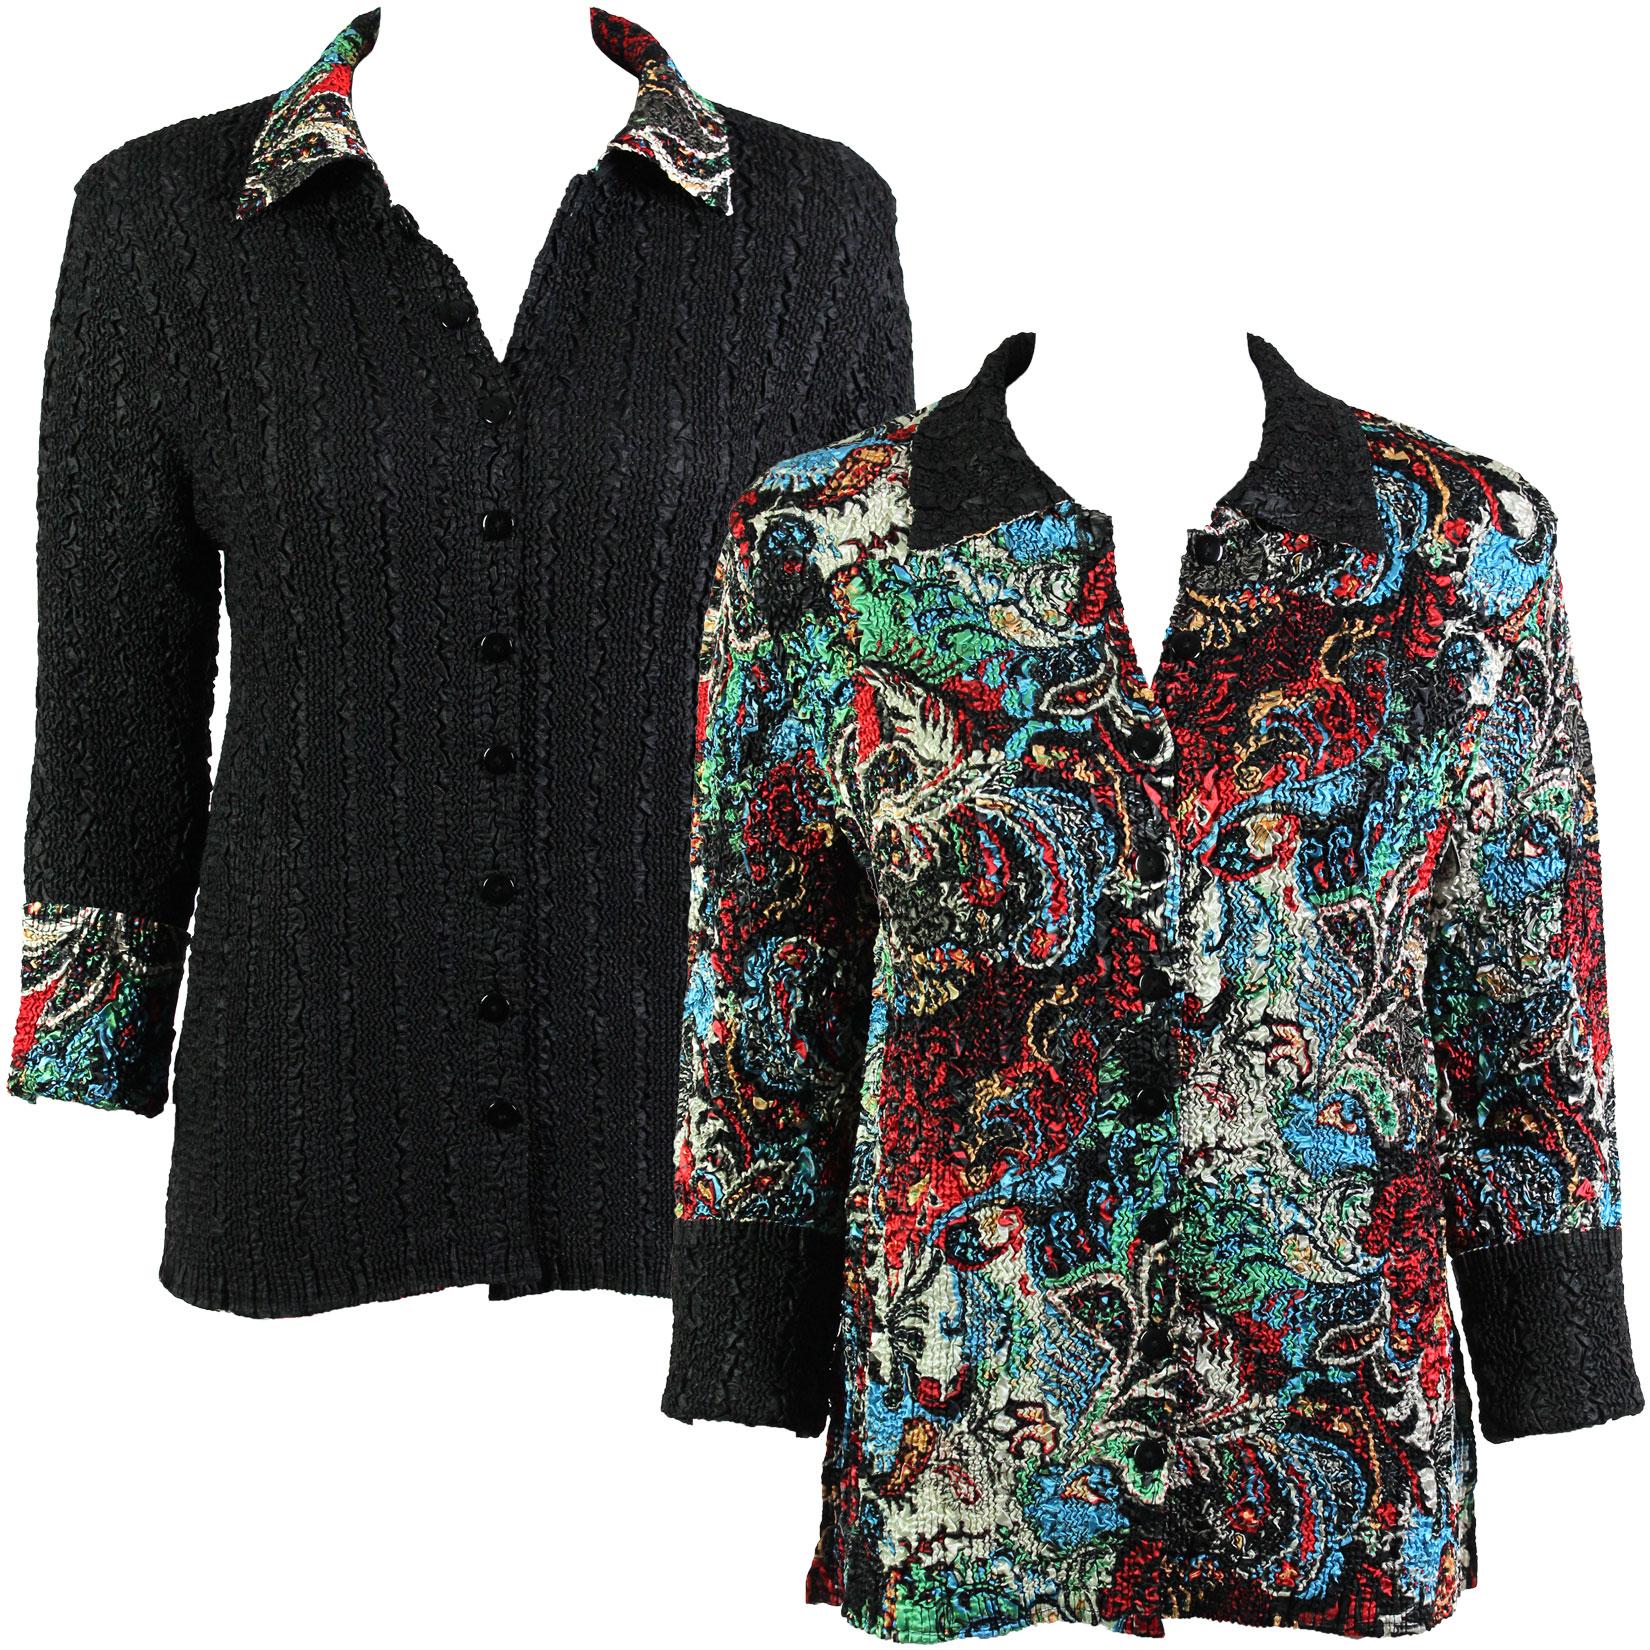 Magic Crush - Reversible Jackets - #3002 Multi Colored Paisley